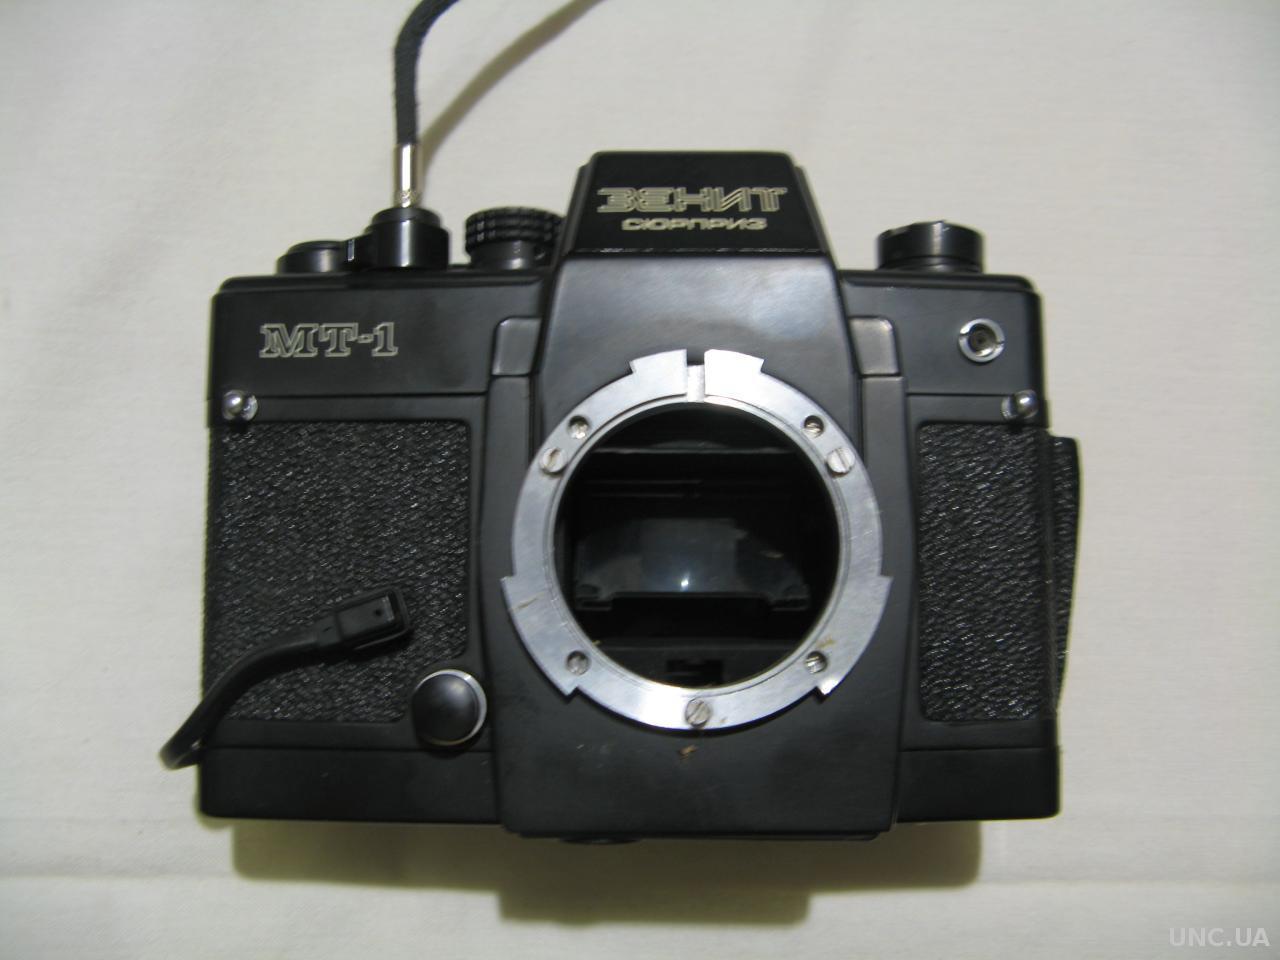 Fotoapparat Zenit Mt 1 Sssr Kupit Na Aukcion Dlya Kollekcionerov Unc Ua